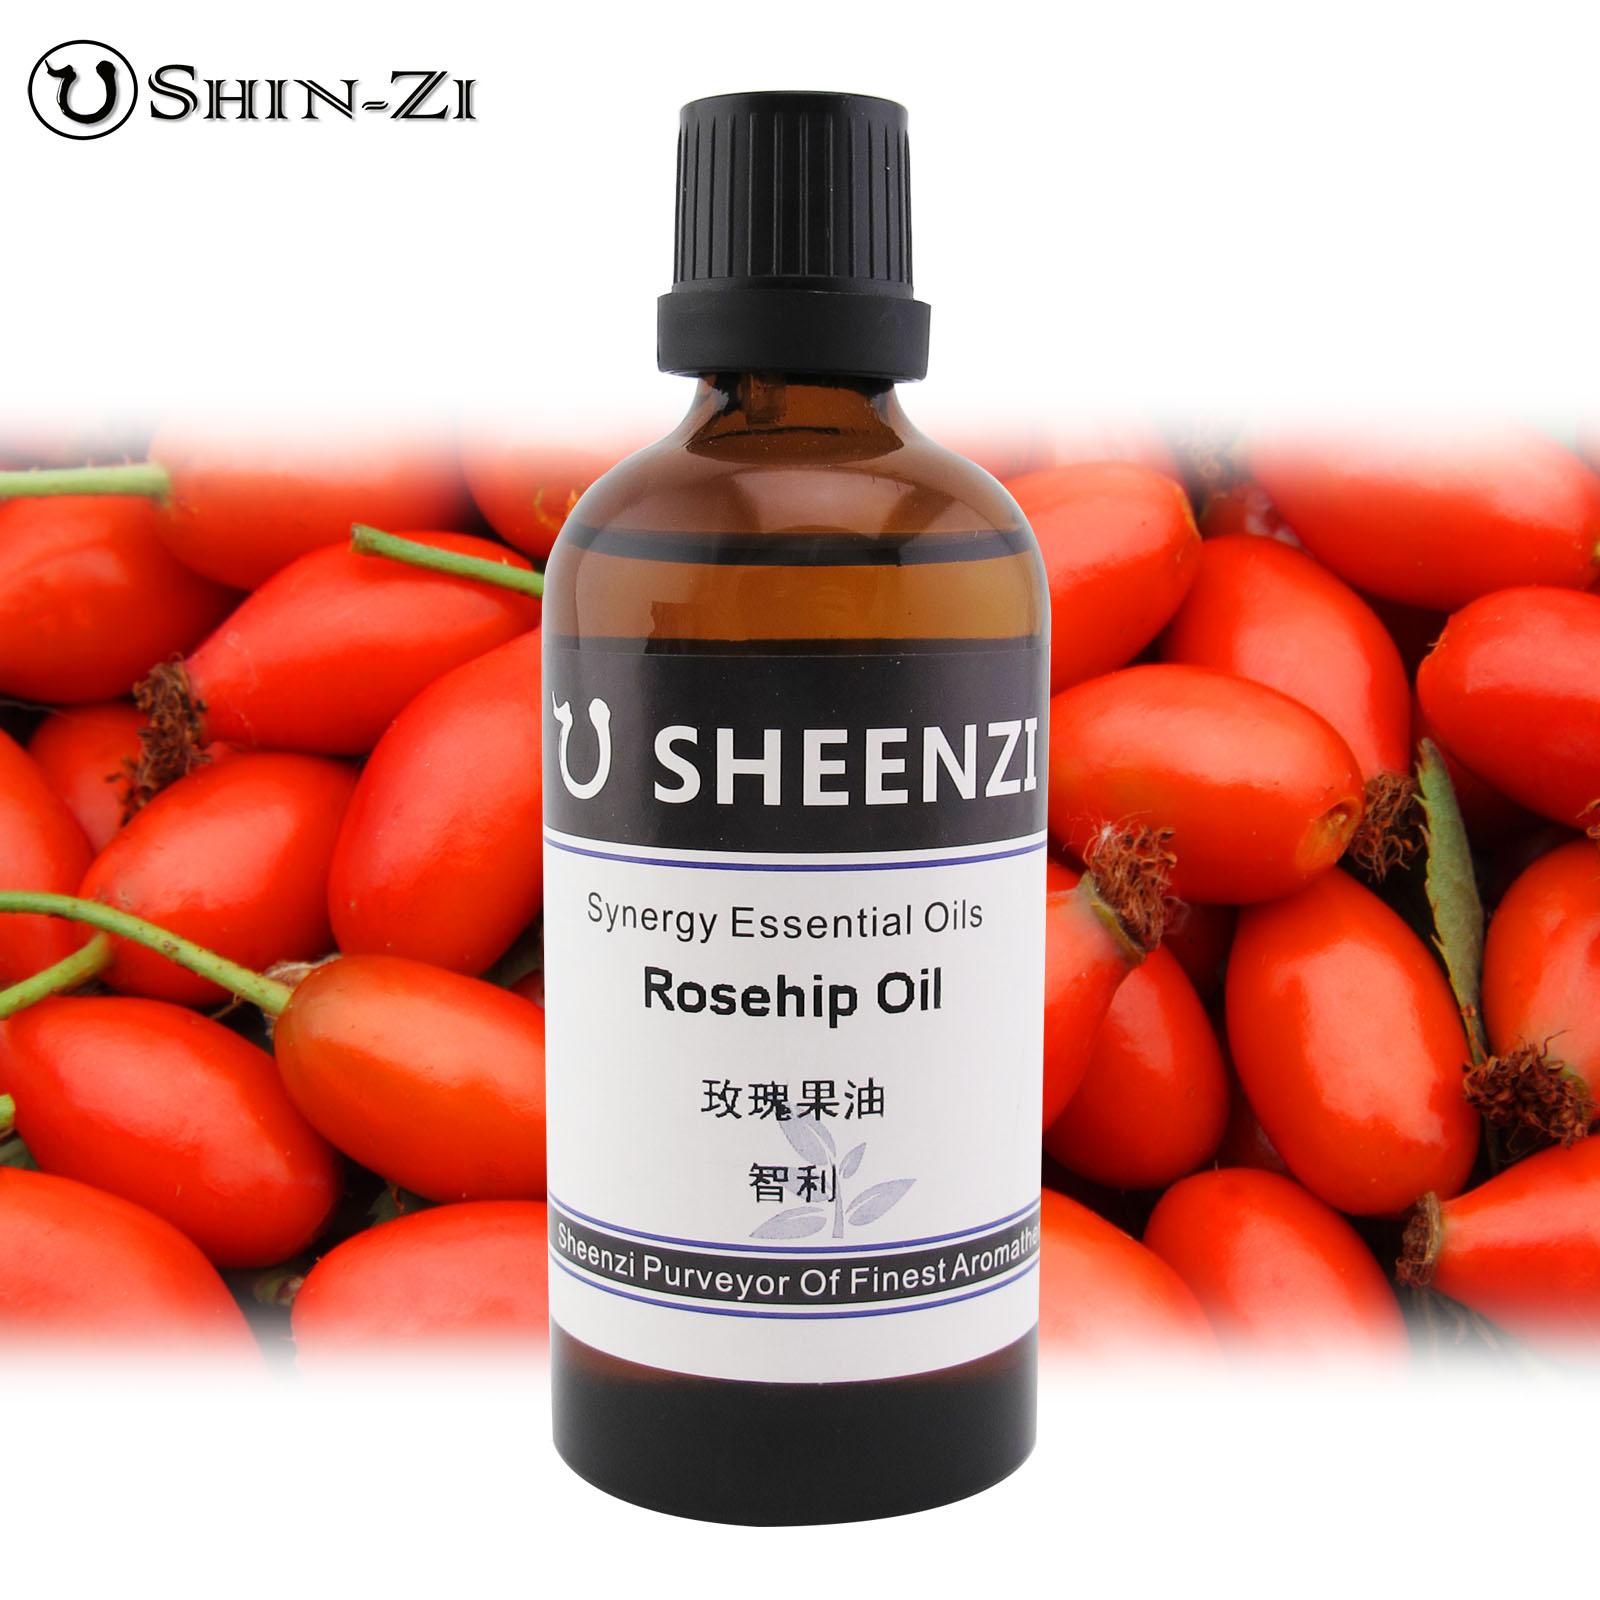 100ml / 1L / 5L 初榨玫瑰果油天然基礎油(智利產區) Rose Hip Oil芳療級按摩油 植物油 身體按摩油 SPA用油 基底油